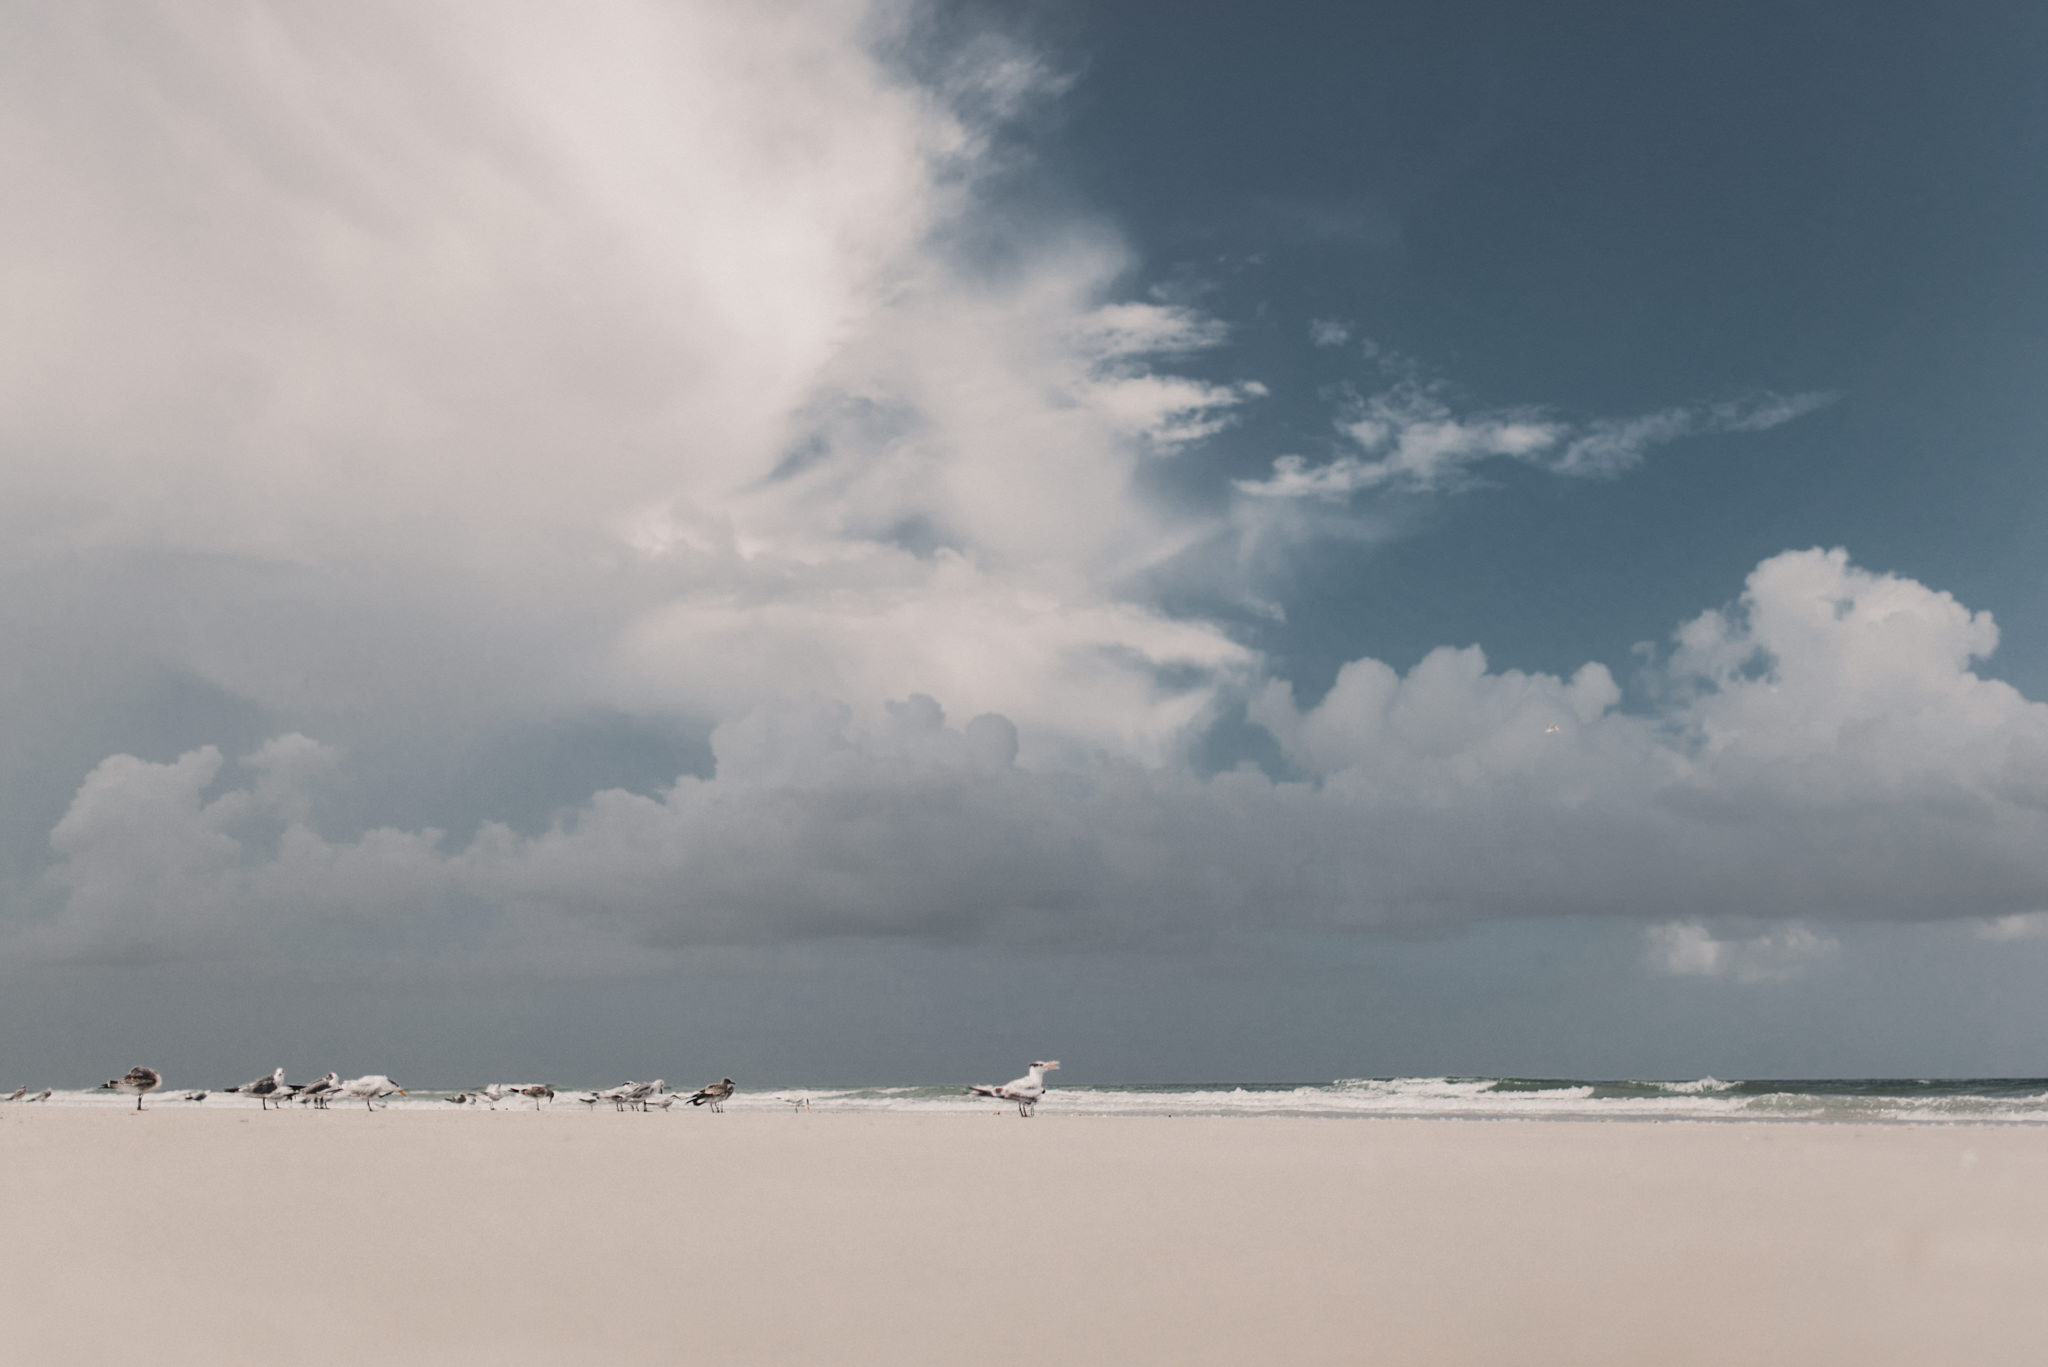 twyla jones photography - treasure coast florida - stormy beach boy playing in sand-.jpg